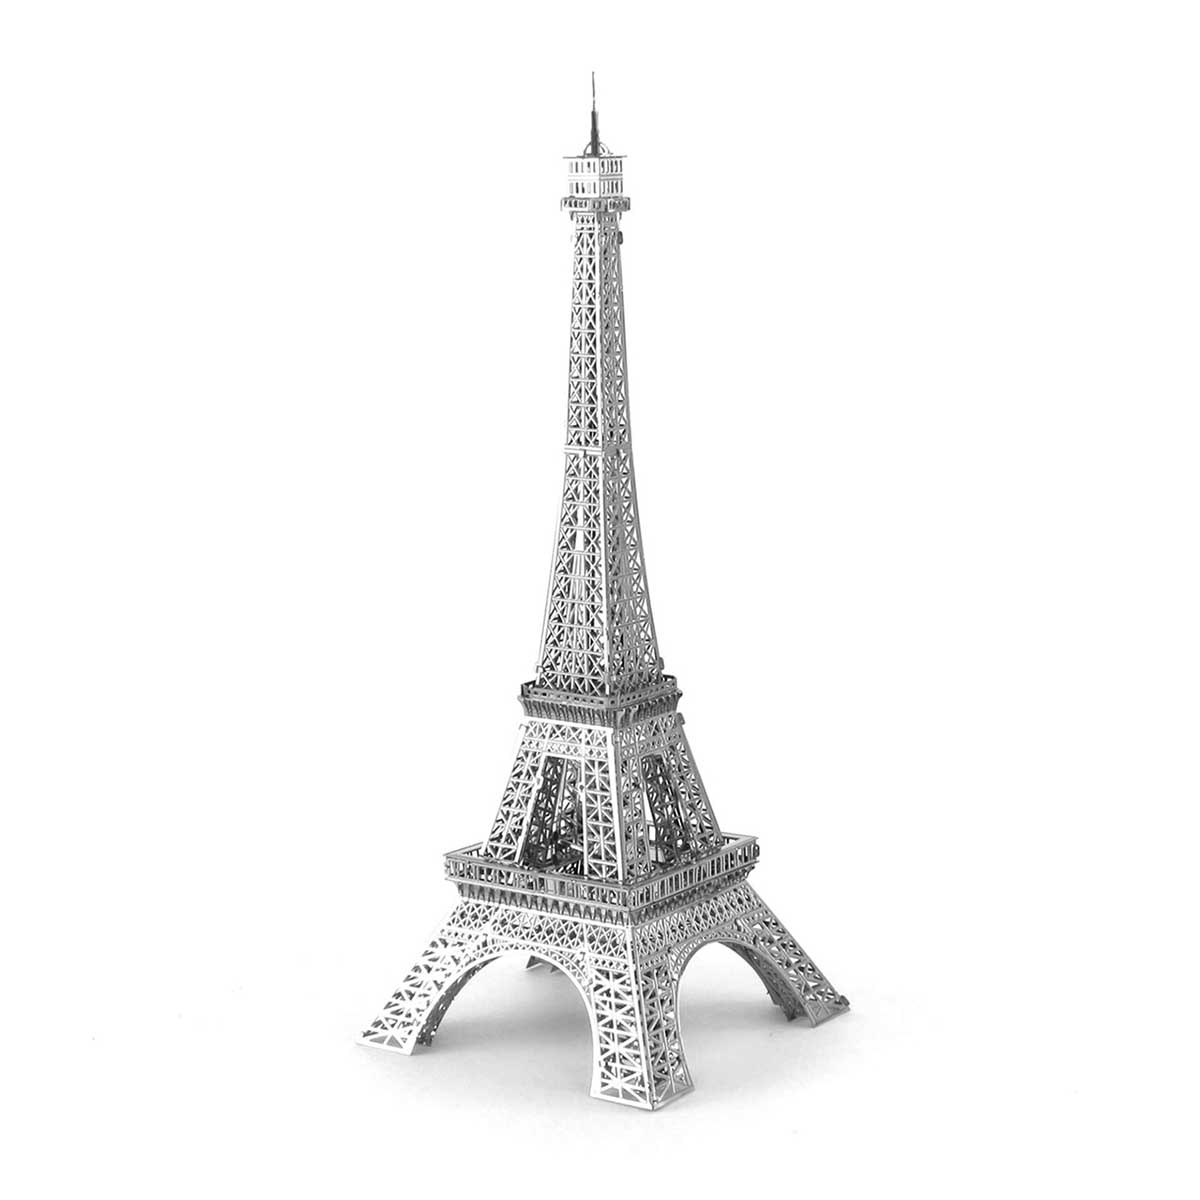 Eiffel Tower Eiffel Tower 3D Puzzle